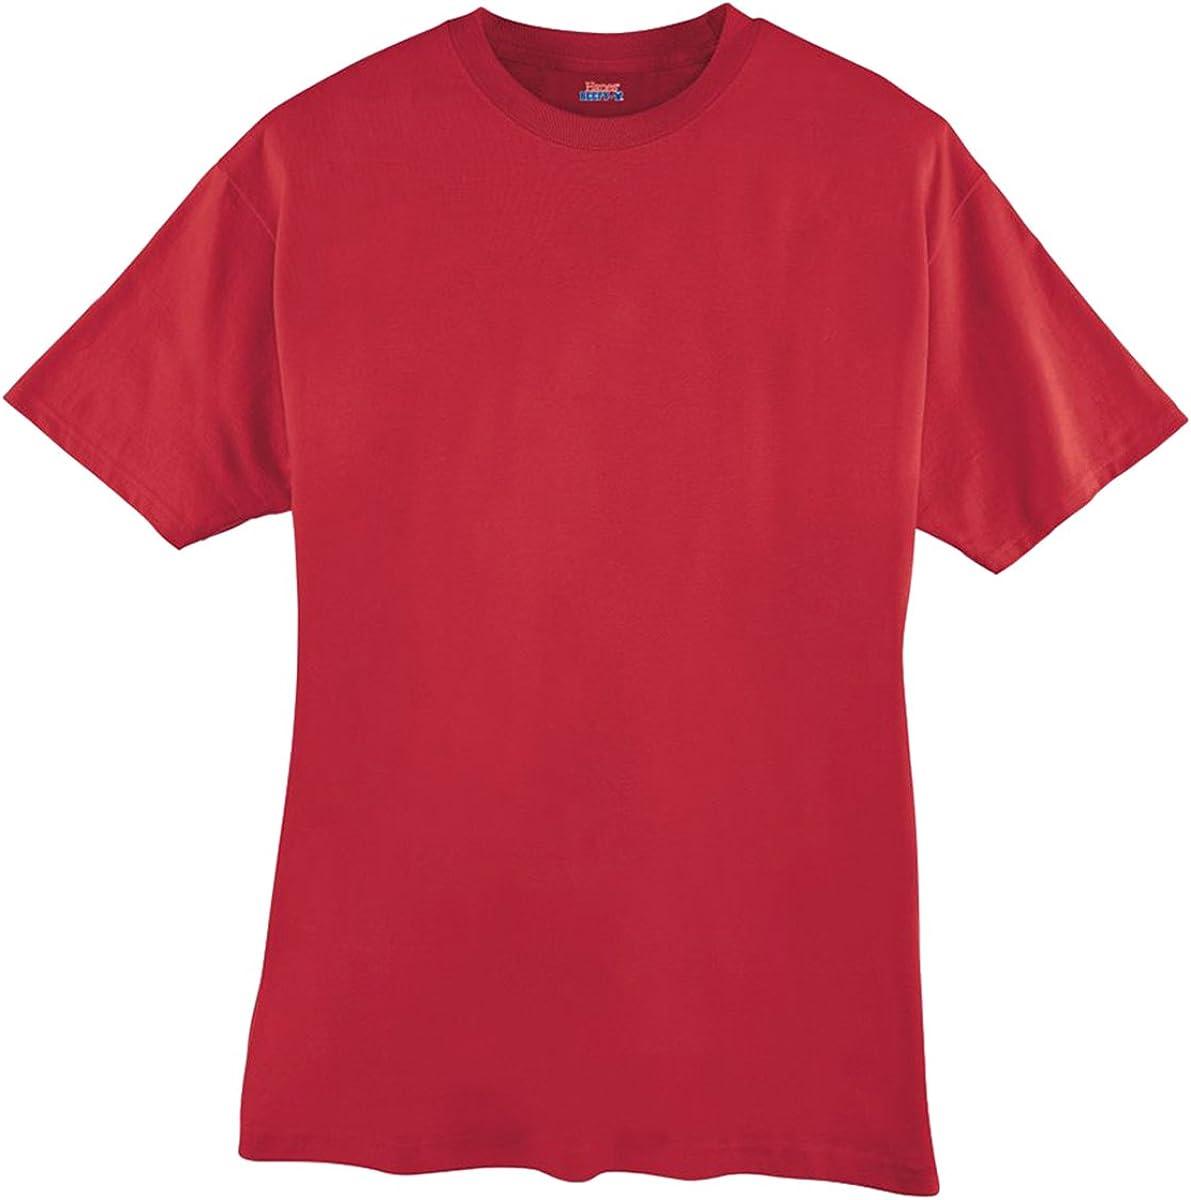 Men's Beefy-T Tall T-Shirt_Deep Red_XXX-Large TALL